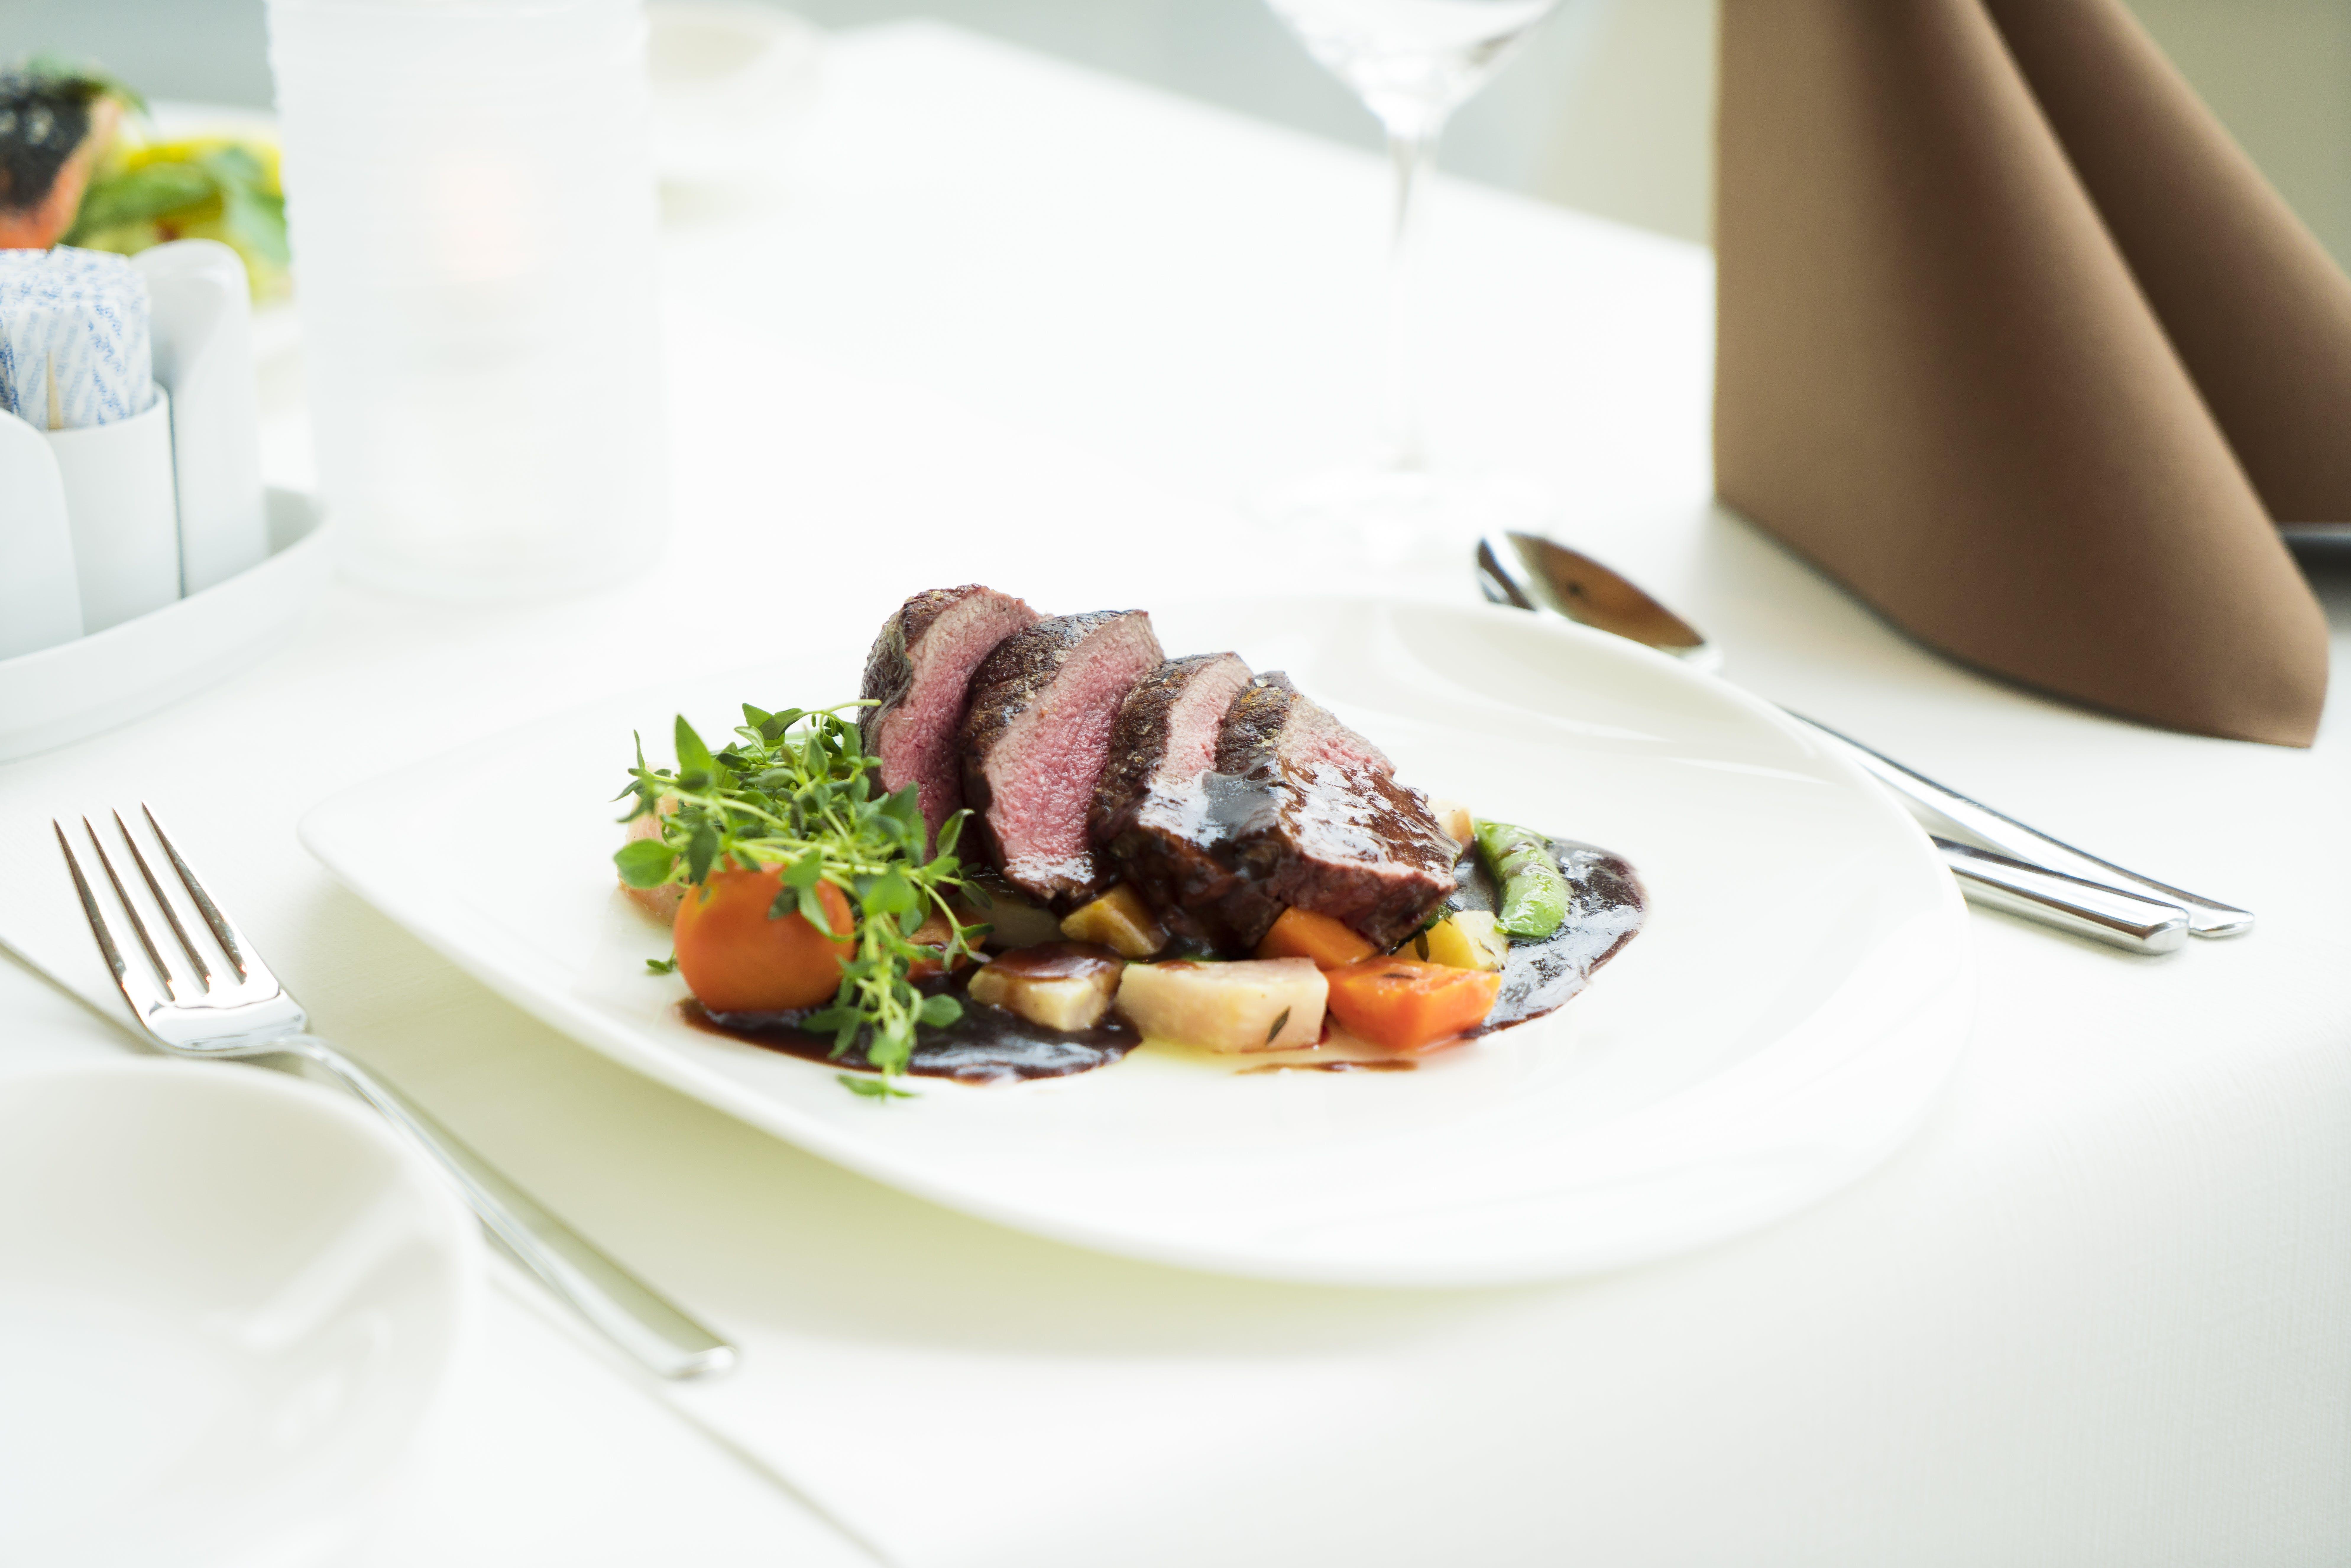 cuisine, cutlery, delicious